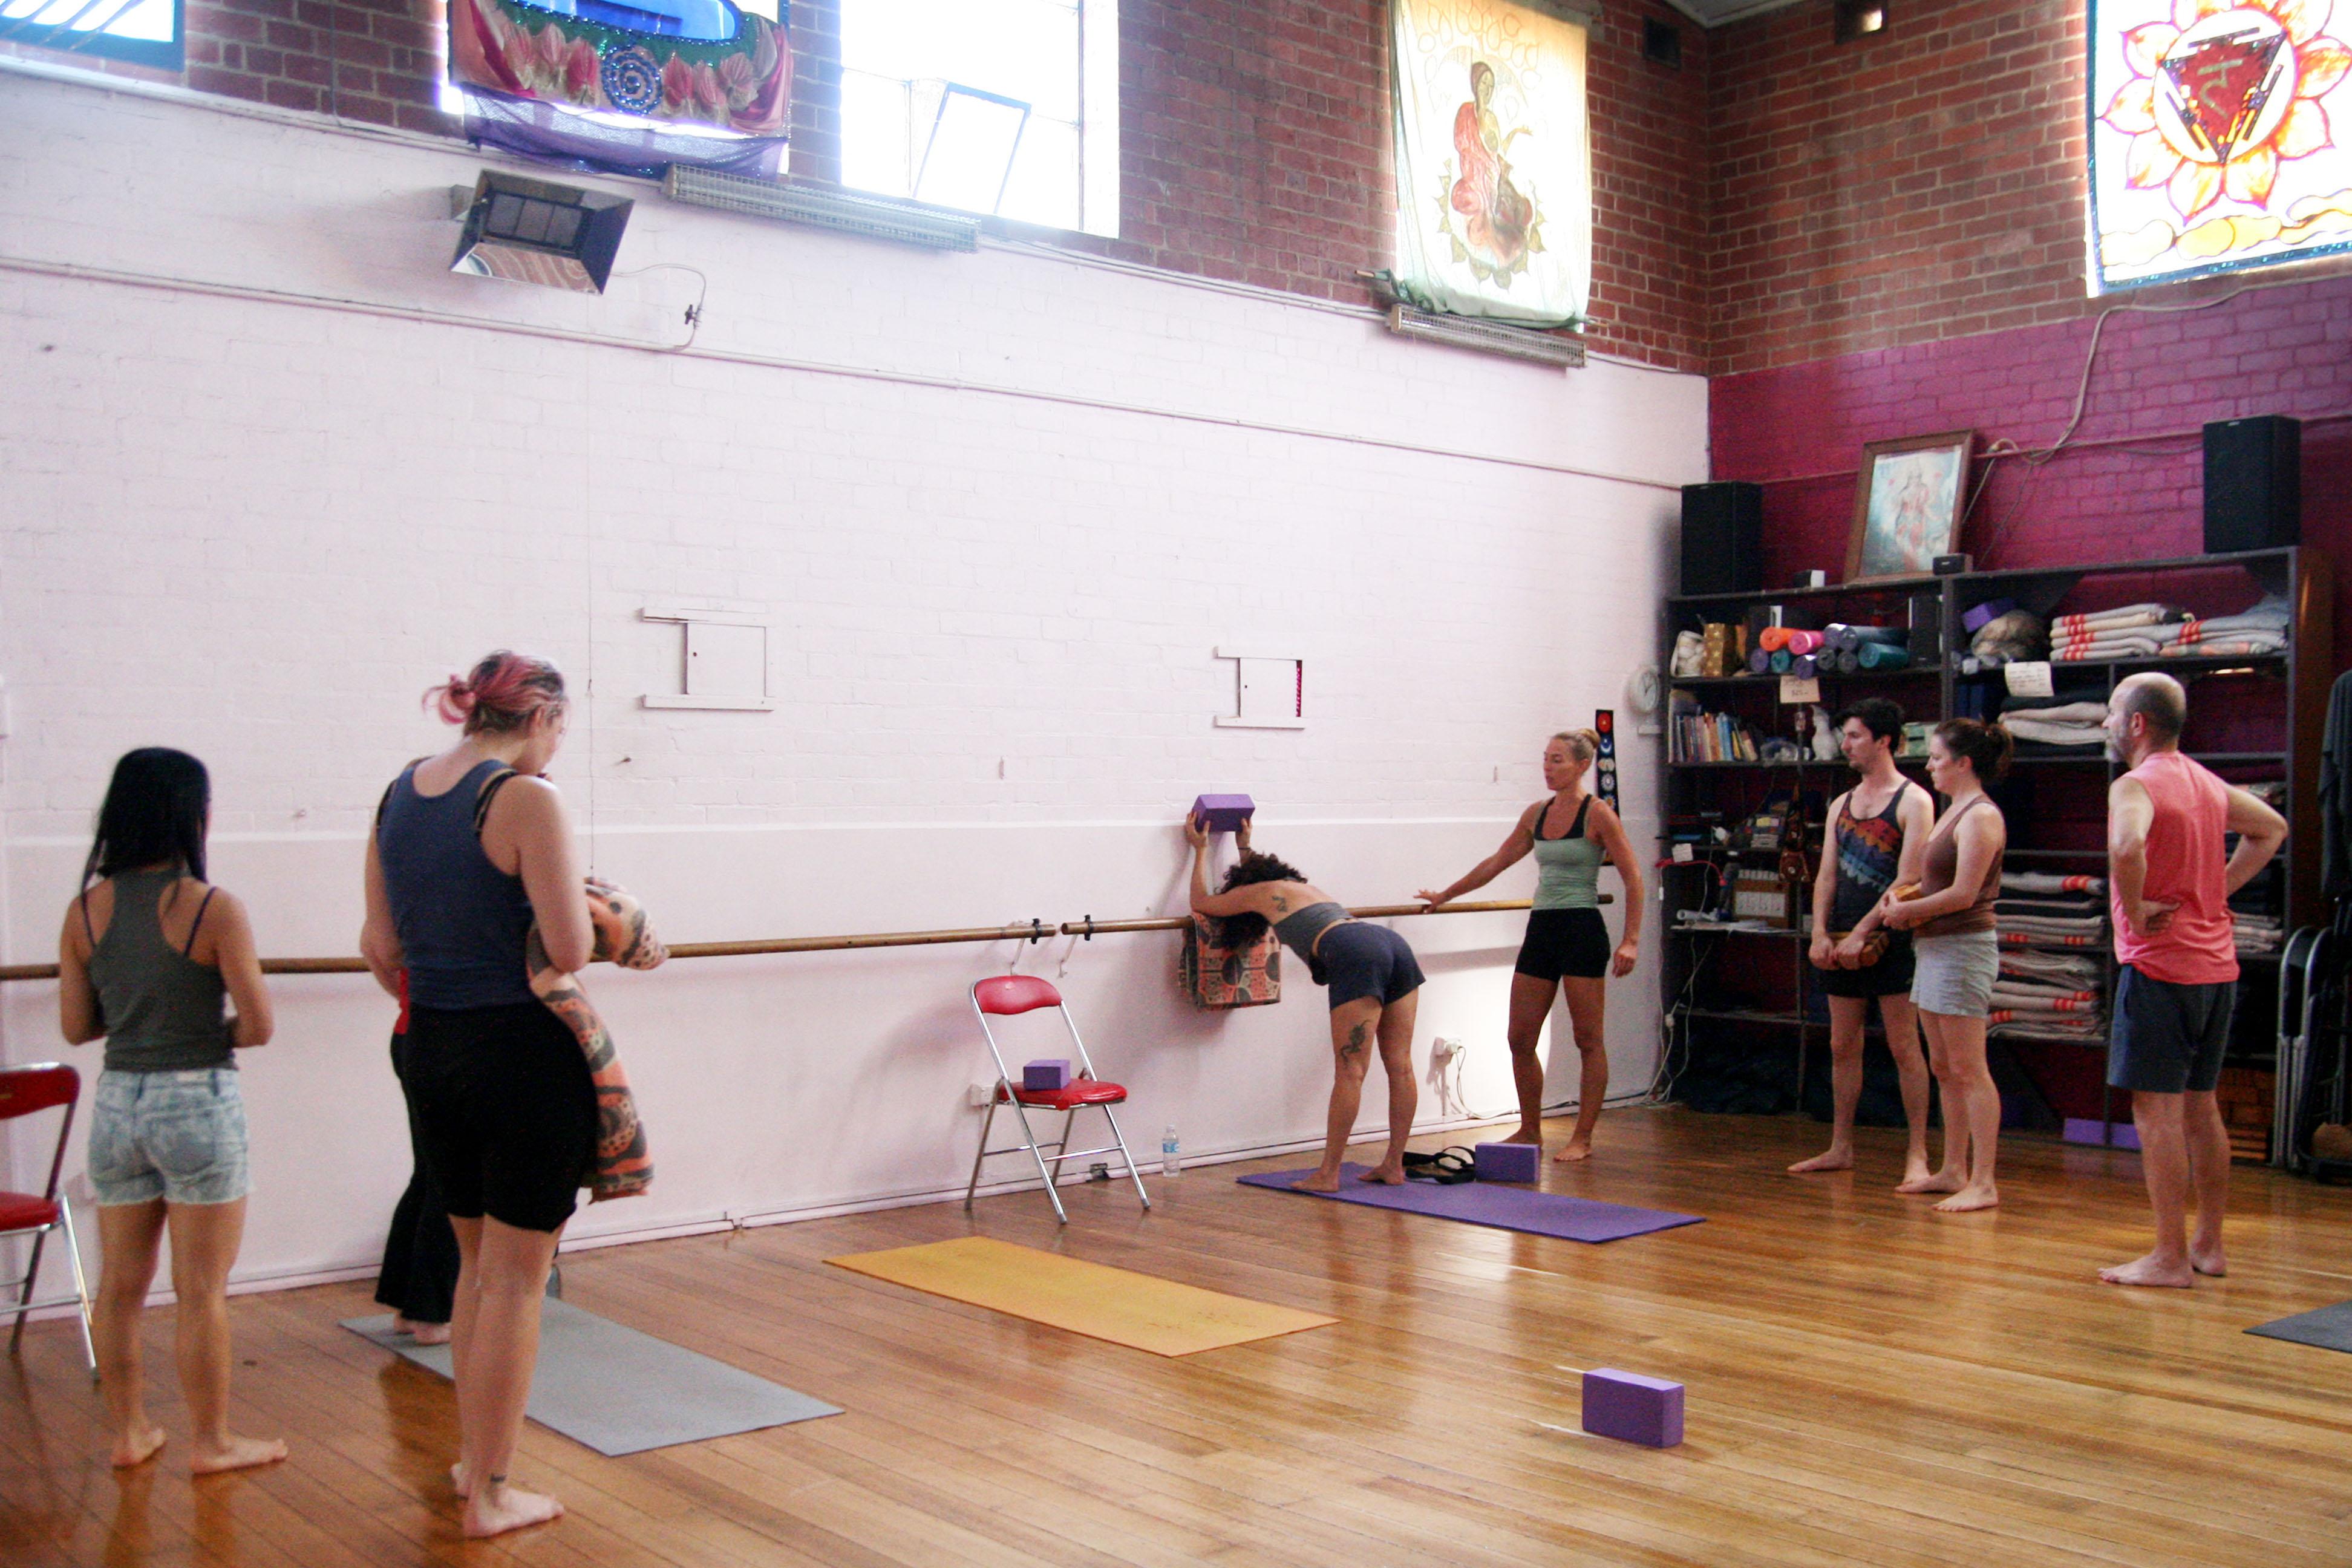 Svastha Health/Dance of Life Workshop, 12 October 2014